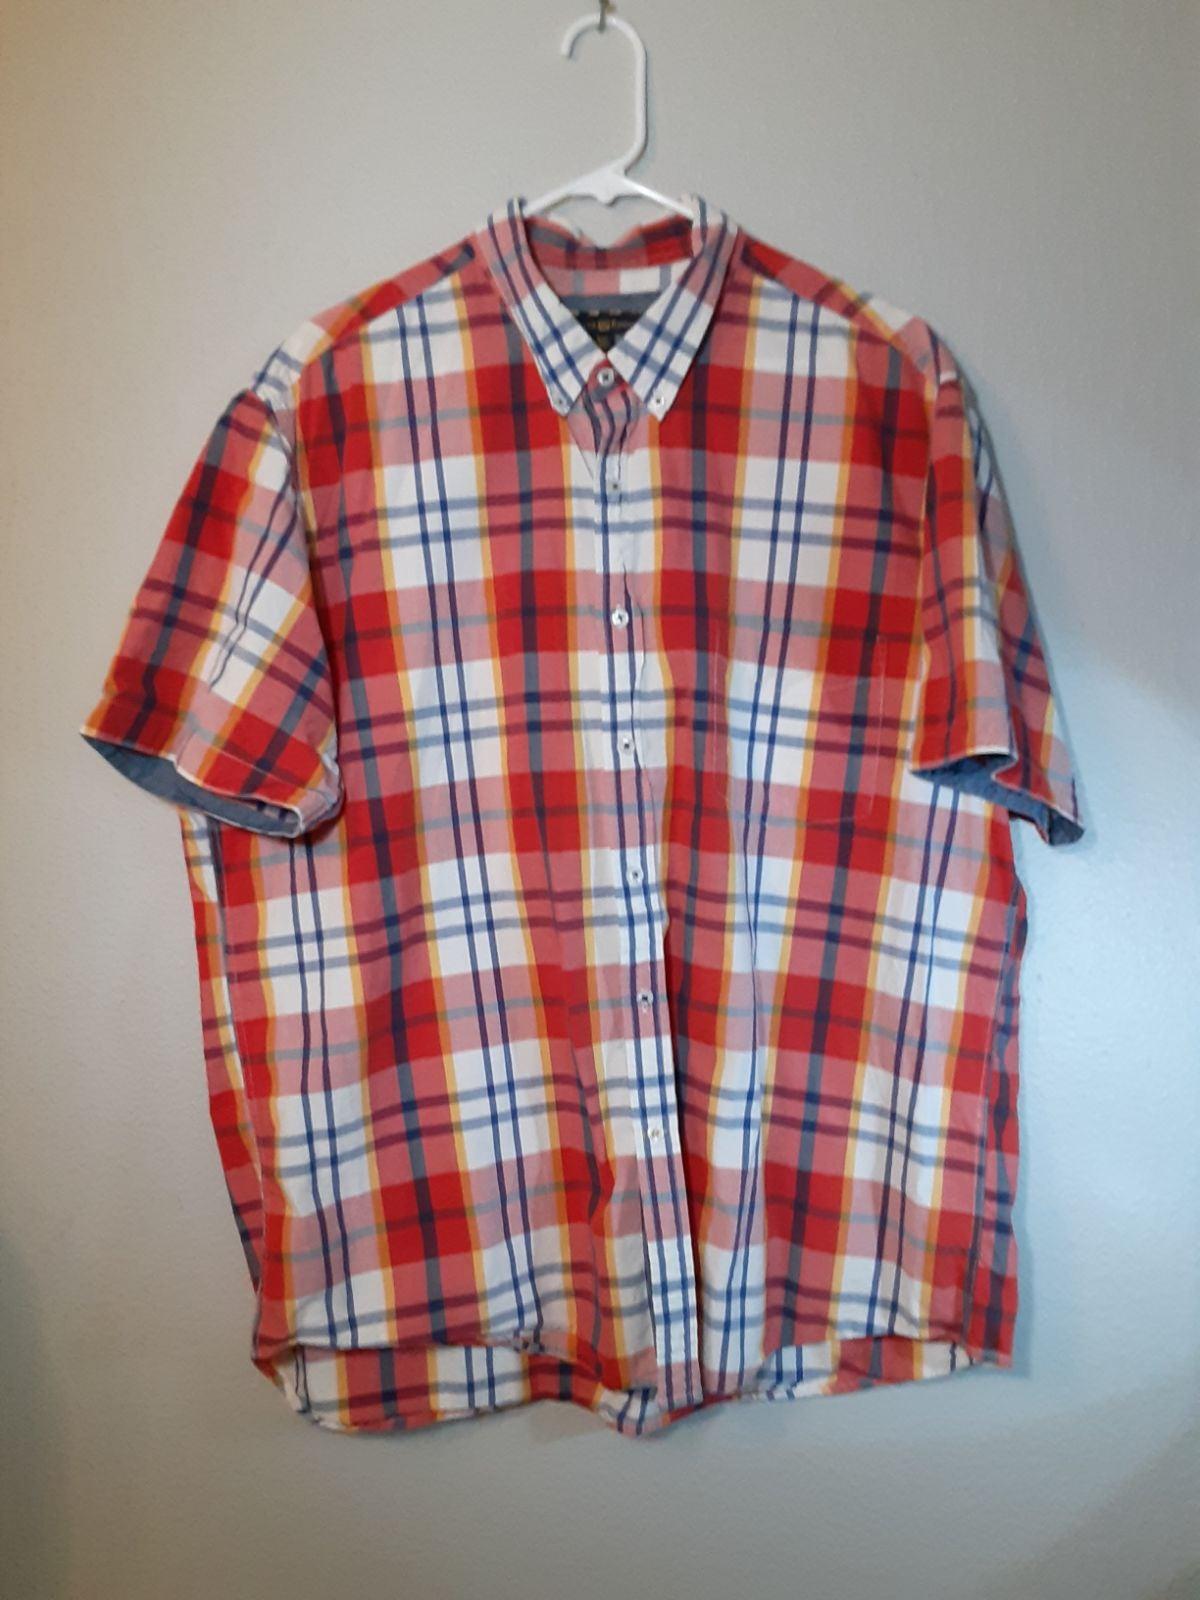 Club Room Short-Sleeve Collared Shirt